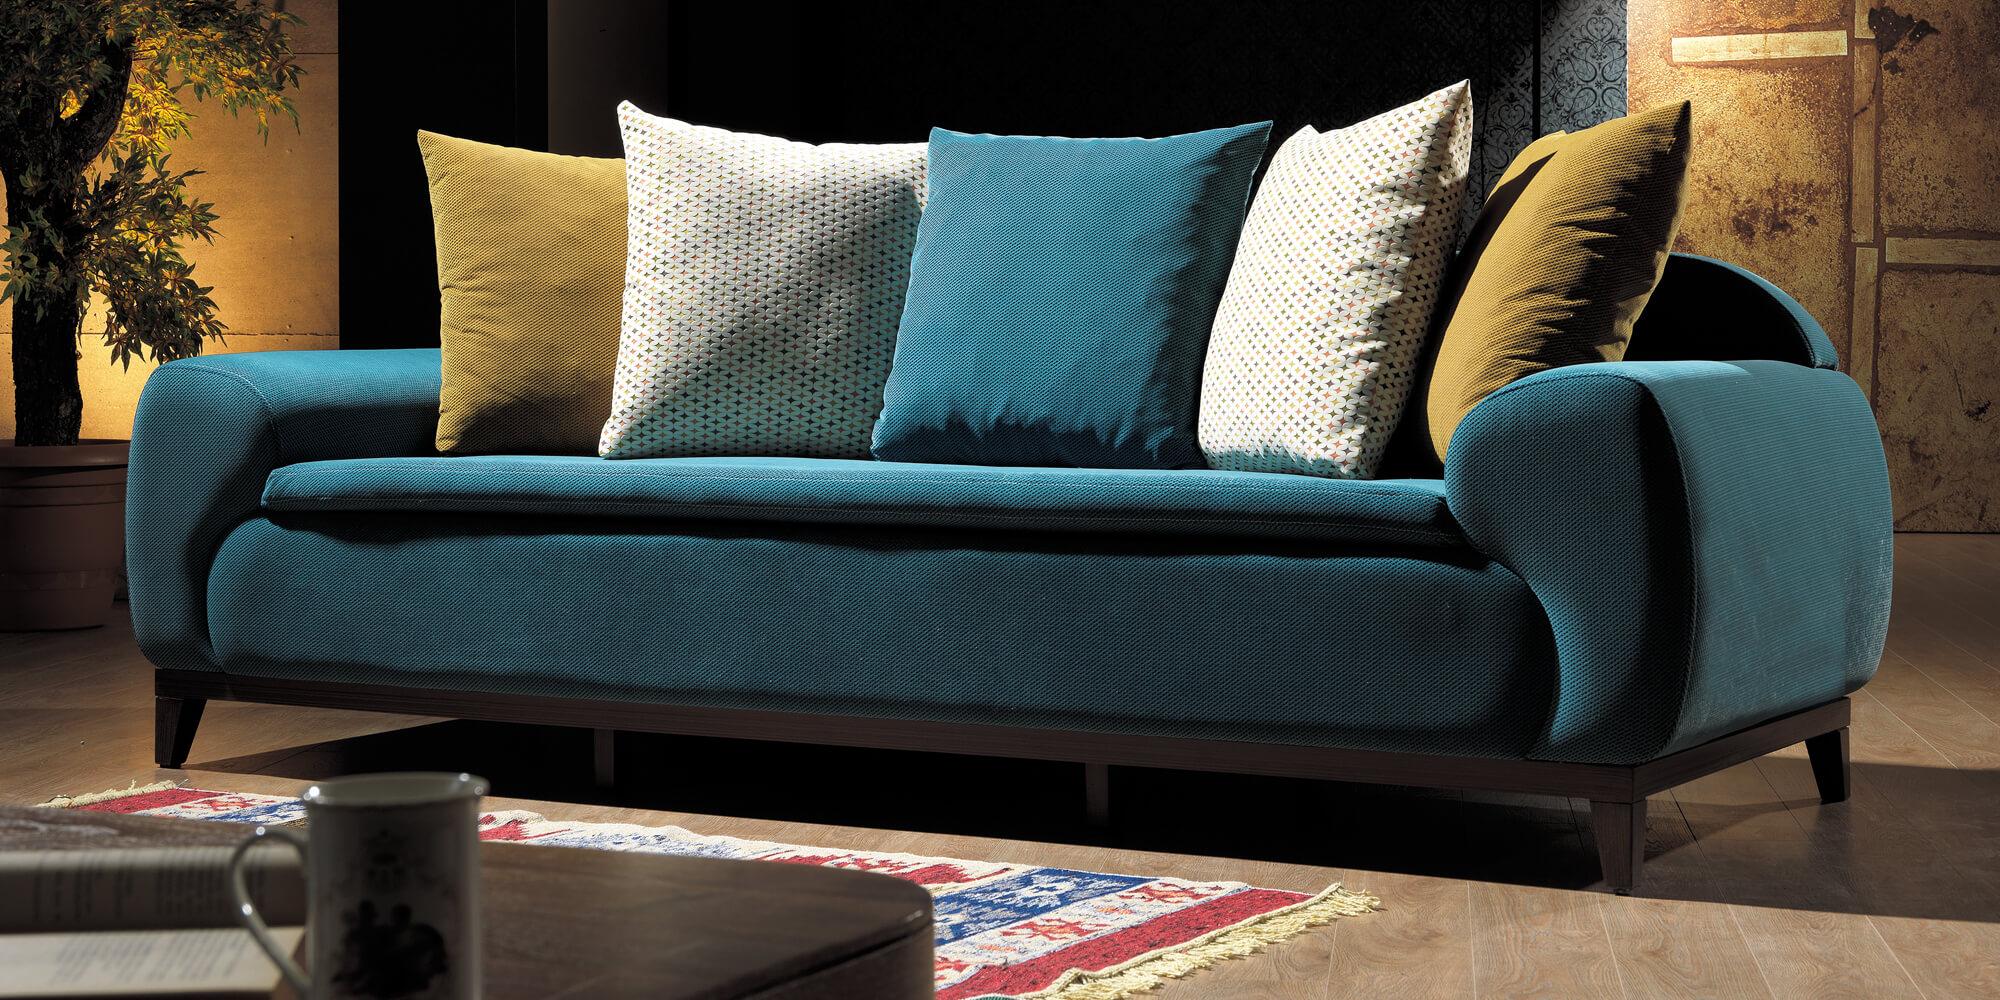 koza 3 2 1 sofa set yuvam m belhaus in wuppertal cilek offizieller h ndler in europa. Black Bedroom Furniture Sets. Home Design Ideas